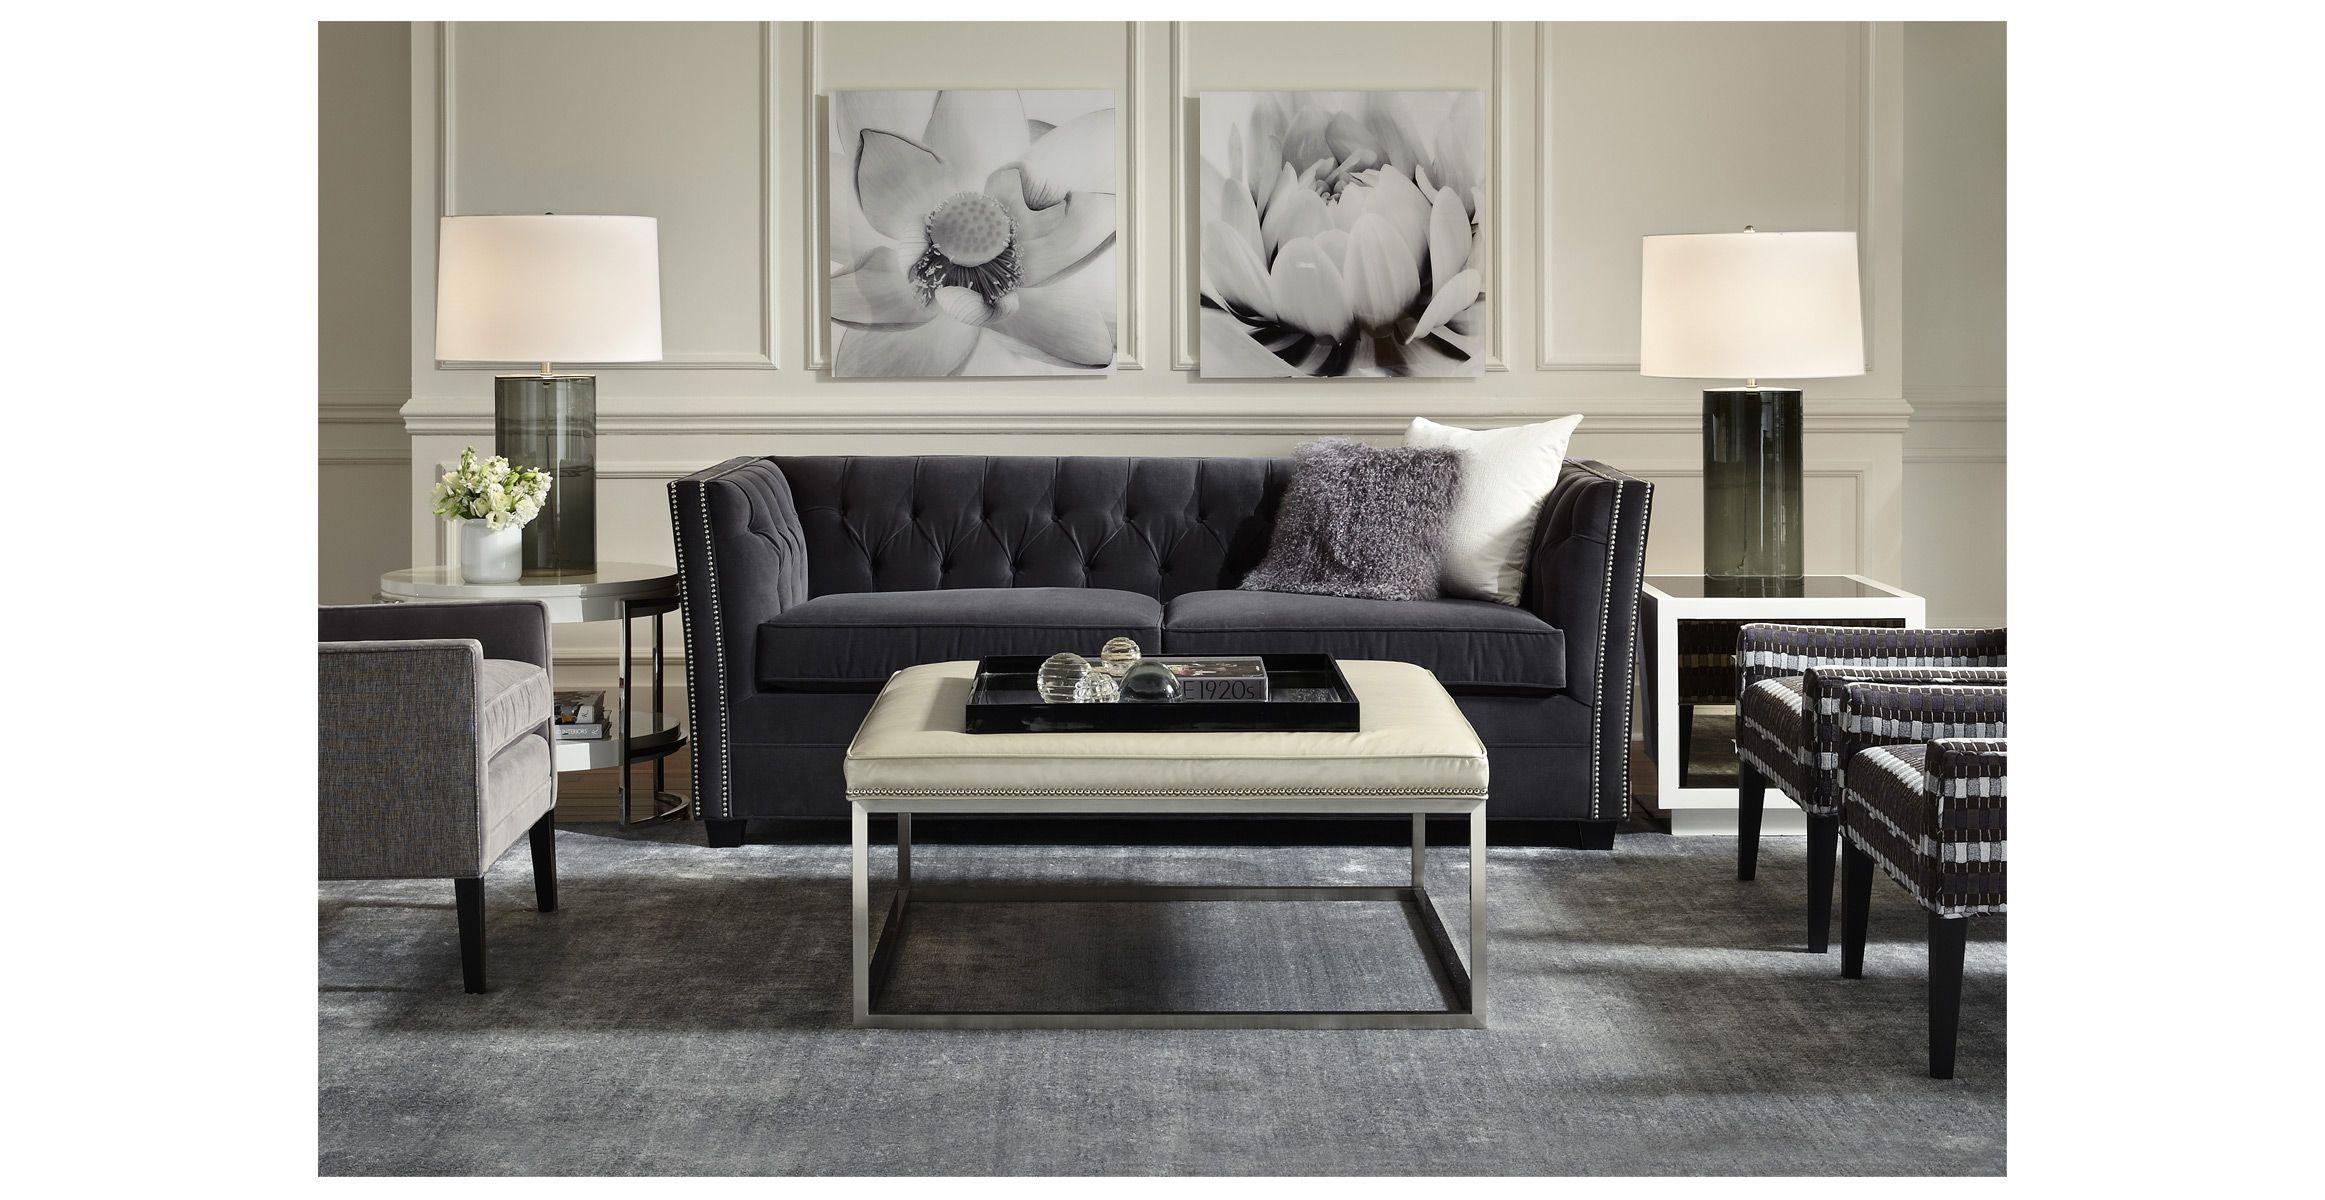 SHIMMER RUG Mitchell Gold + Bob Williams Clean sofa